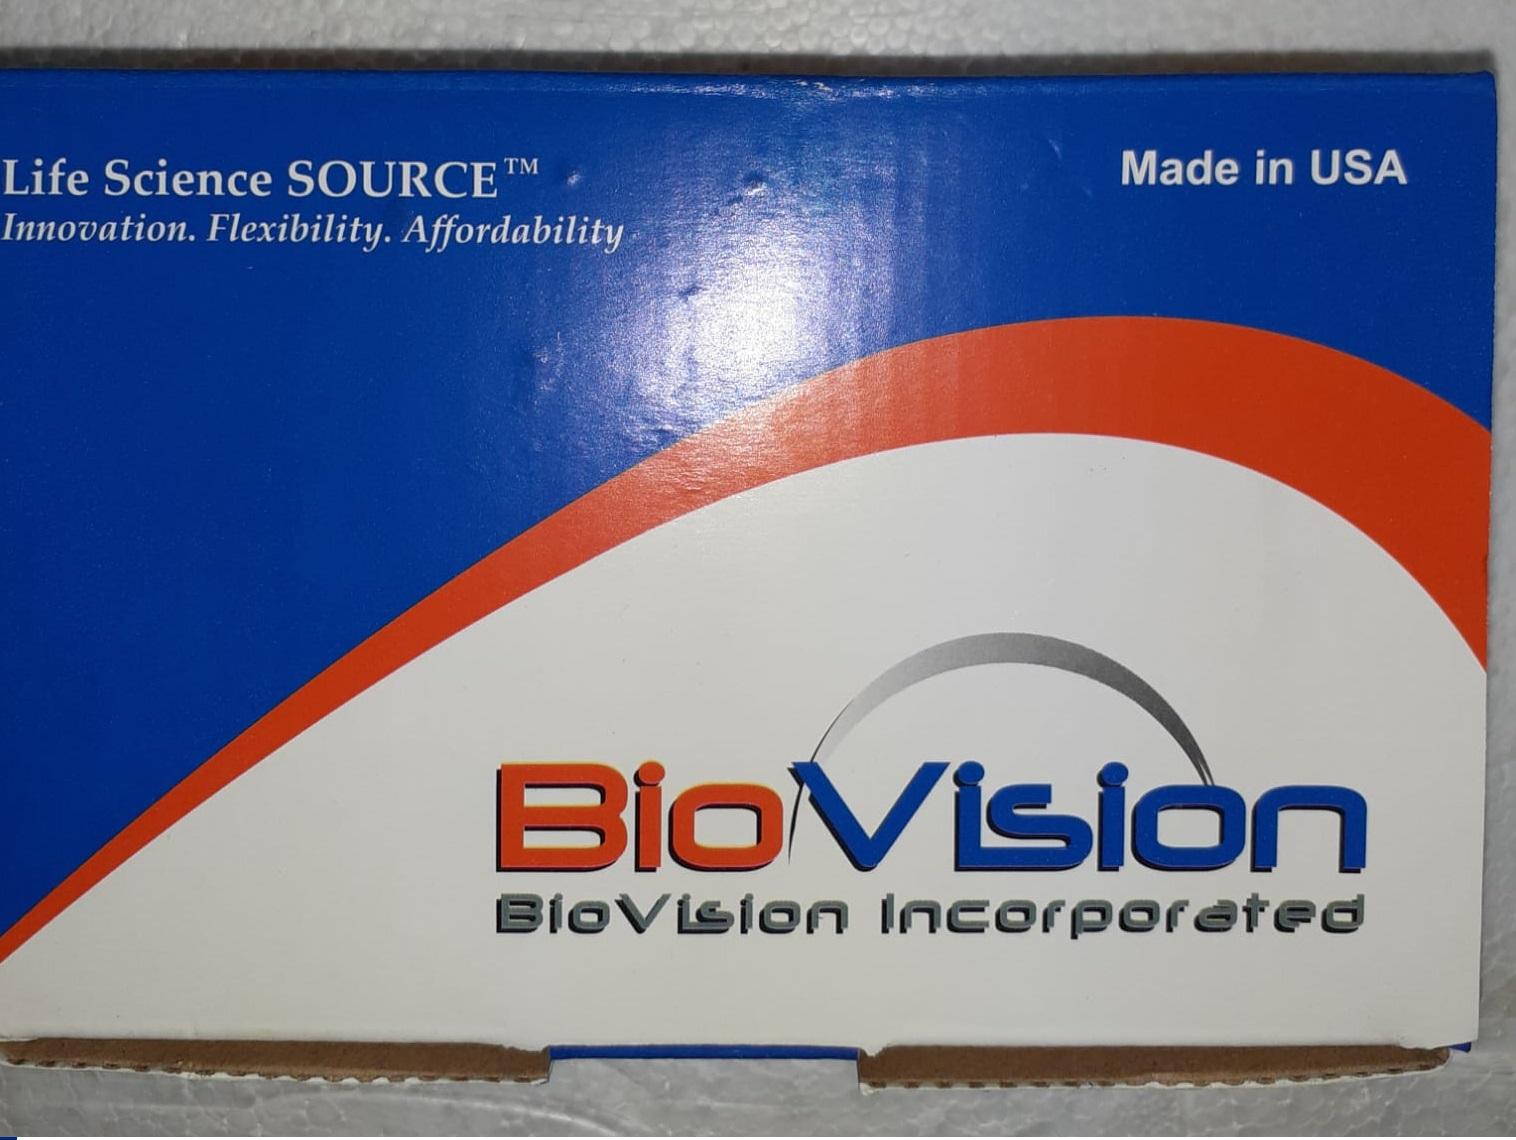 Biovision Life Science